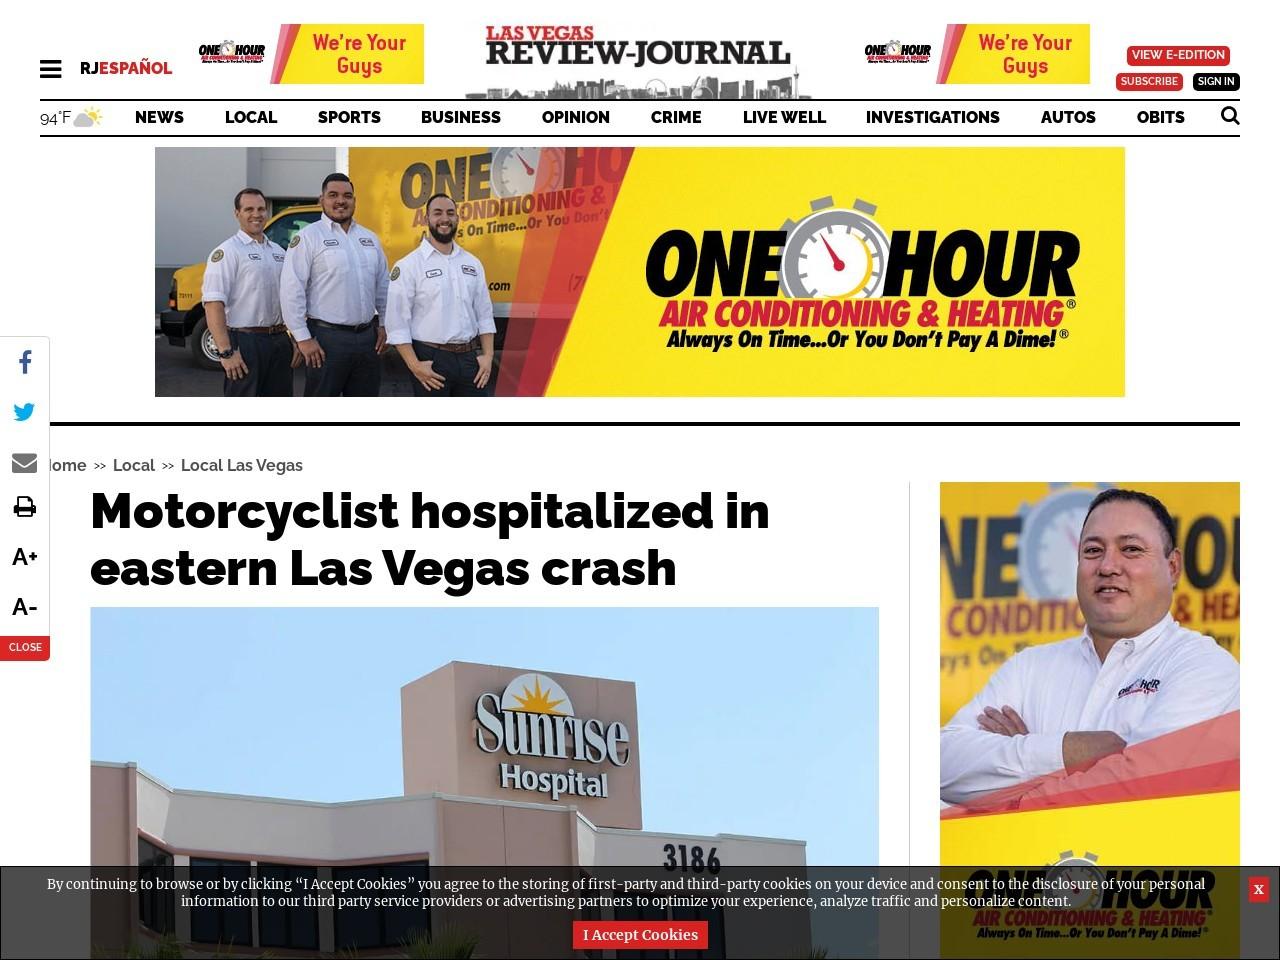 Motorcyclist hospitalized in eastern Las Vegas crash